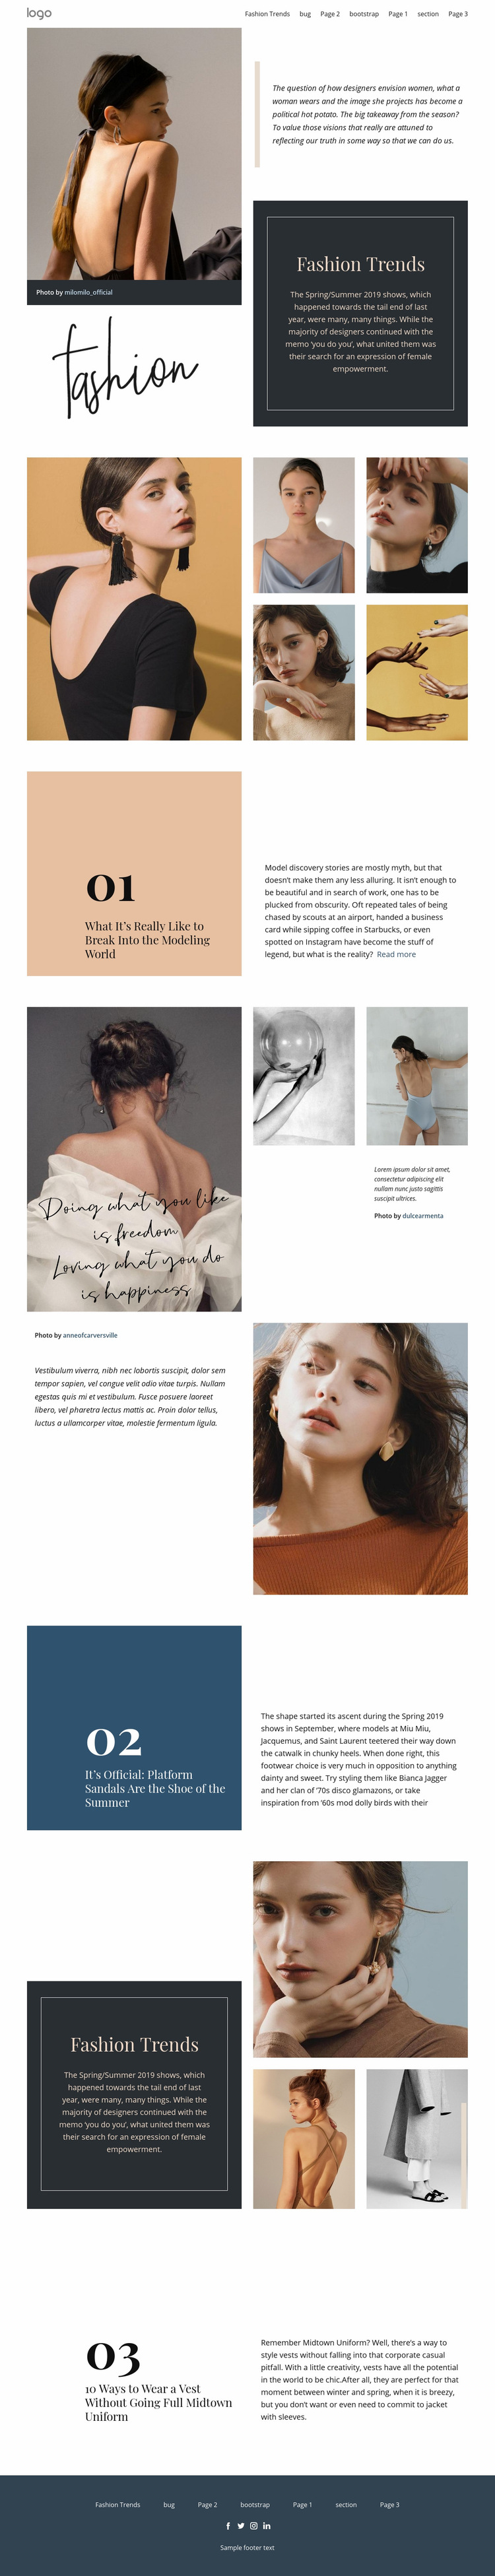 Designer vision of fashion Web Page Design